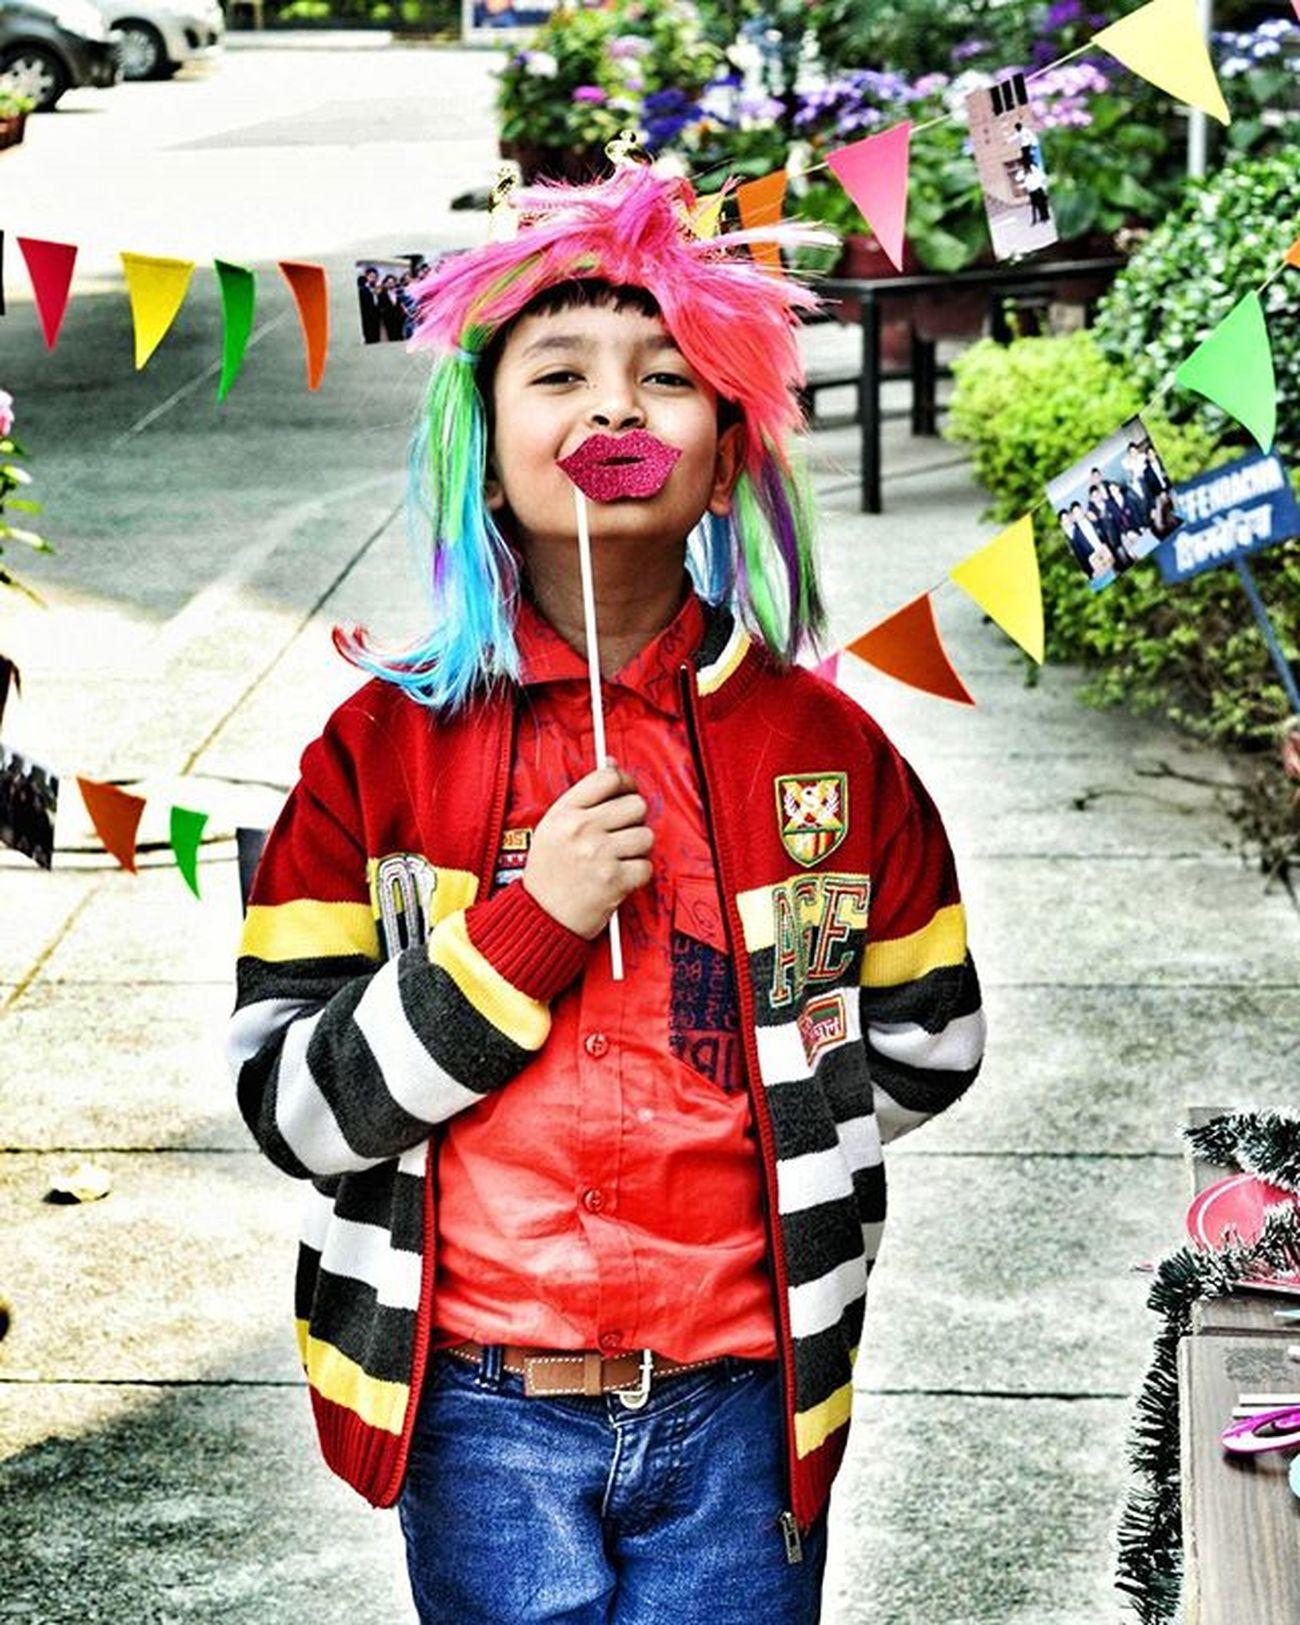 Throwback Bestposerever😂😂😂 ADMIRING Snapseed Nikon💗 Dslrphotography Childhoodmemories